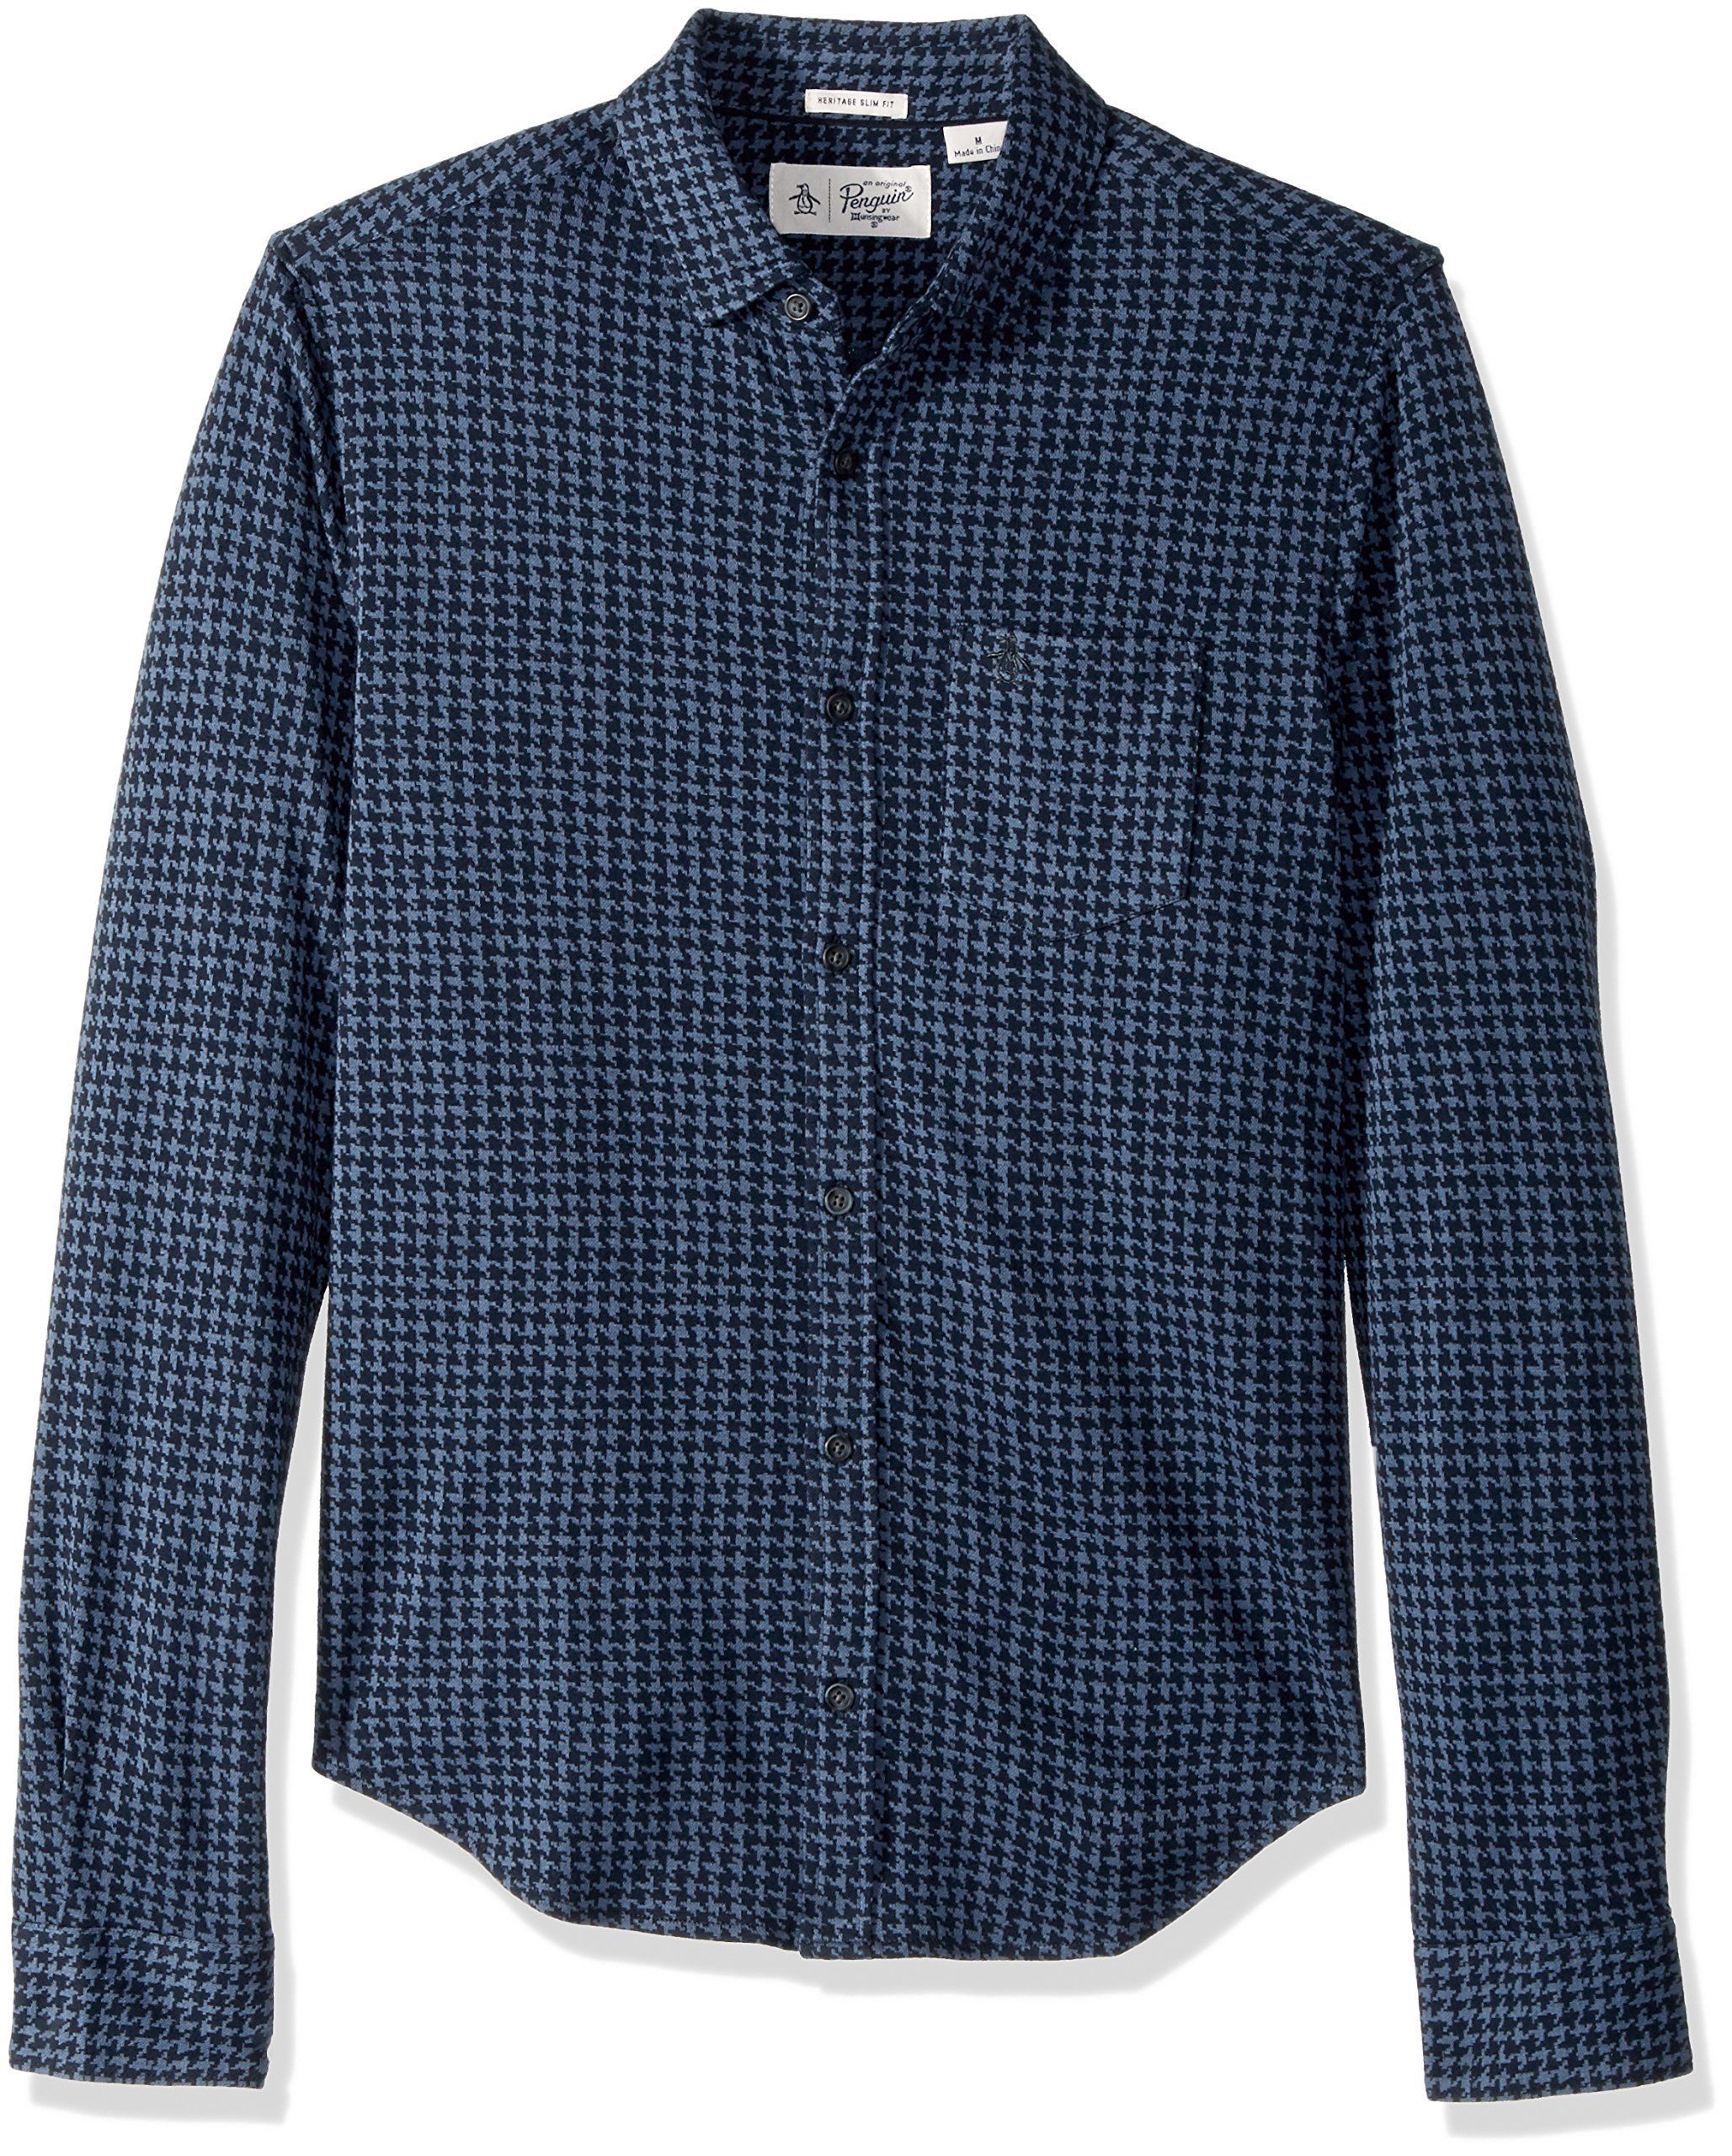 Original Penguin Men's Jacquard Houndstooth Shirt, Dark Sapphire, Large